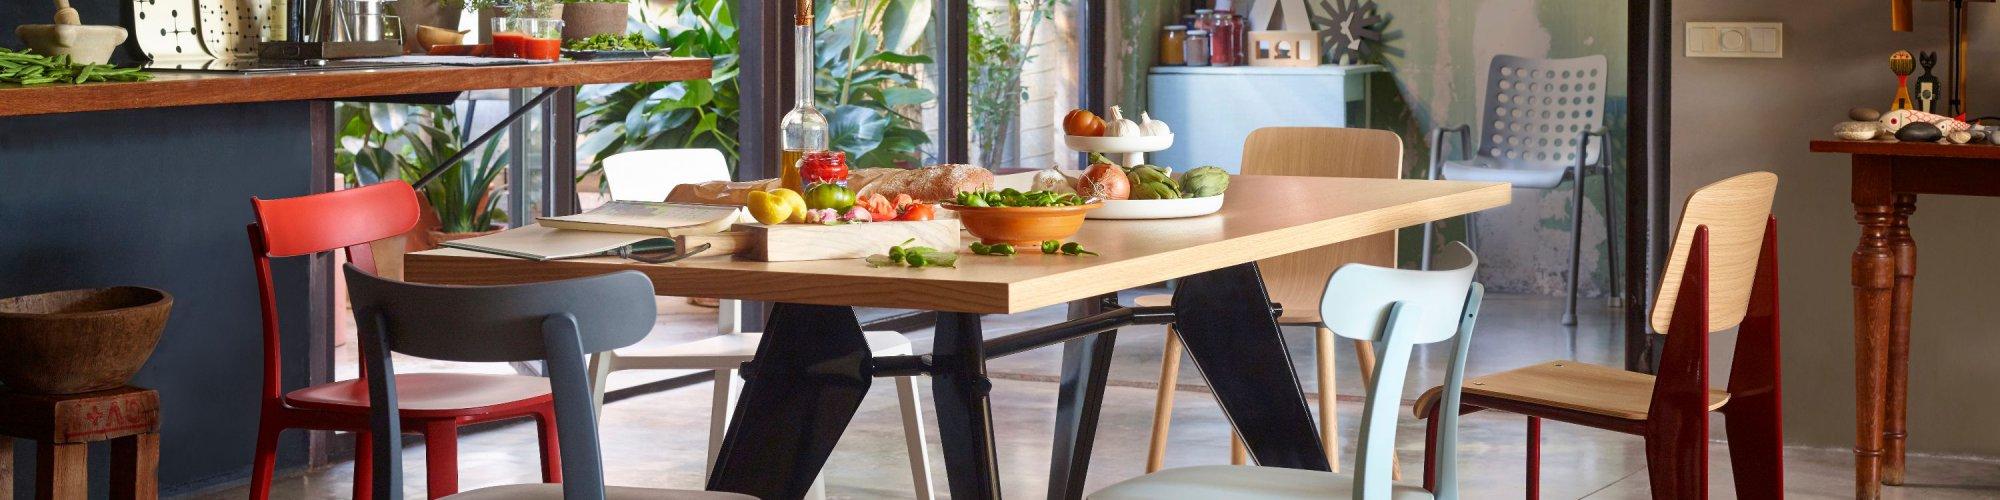 all-plastic-chair-standard-hal-ply-wood-tip-ton-em-table-landi-chair-1704004-master